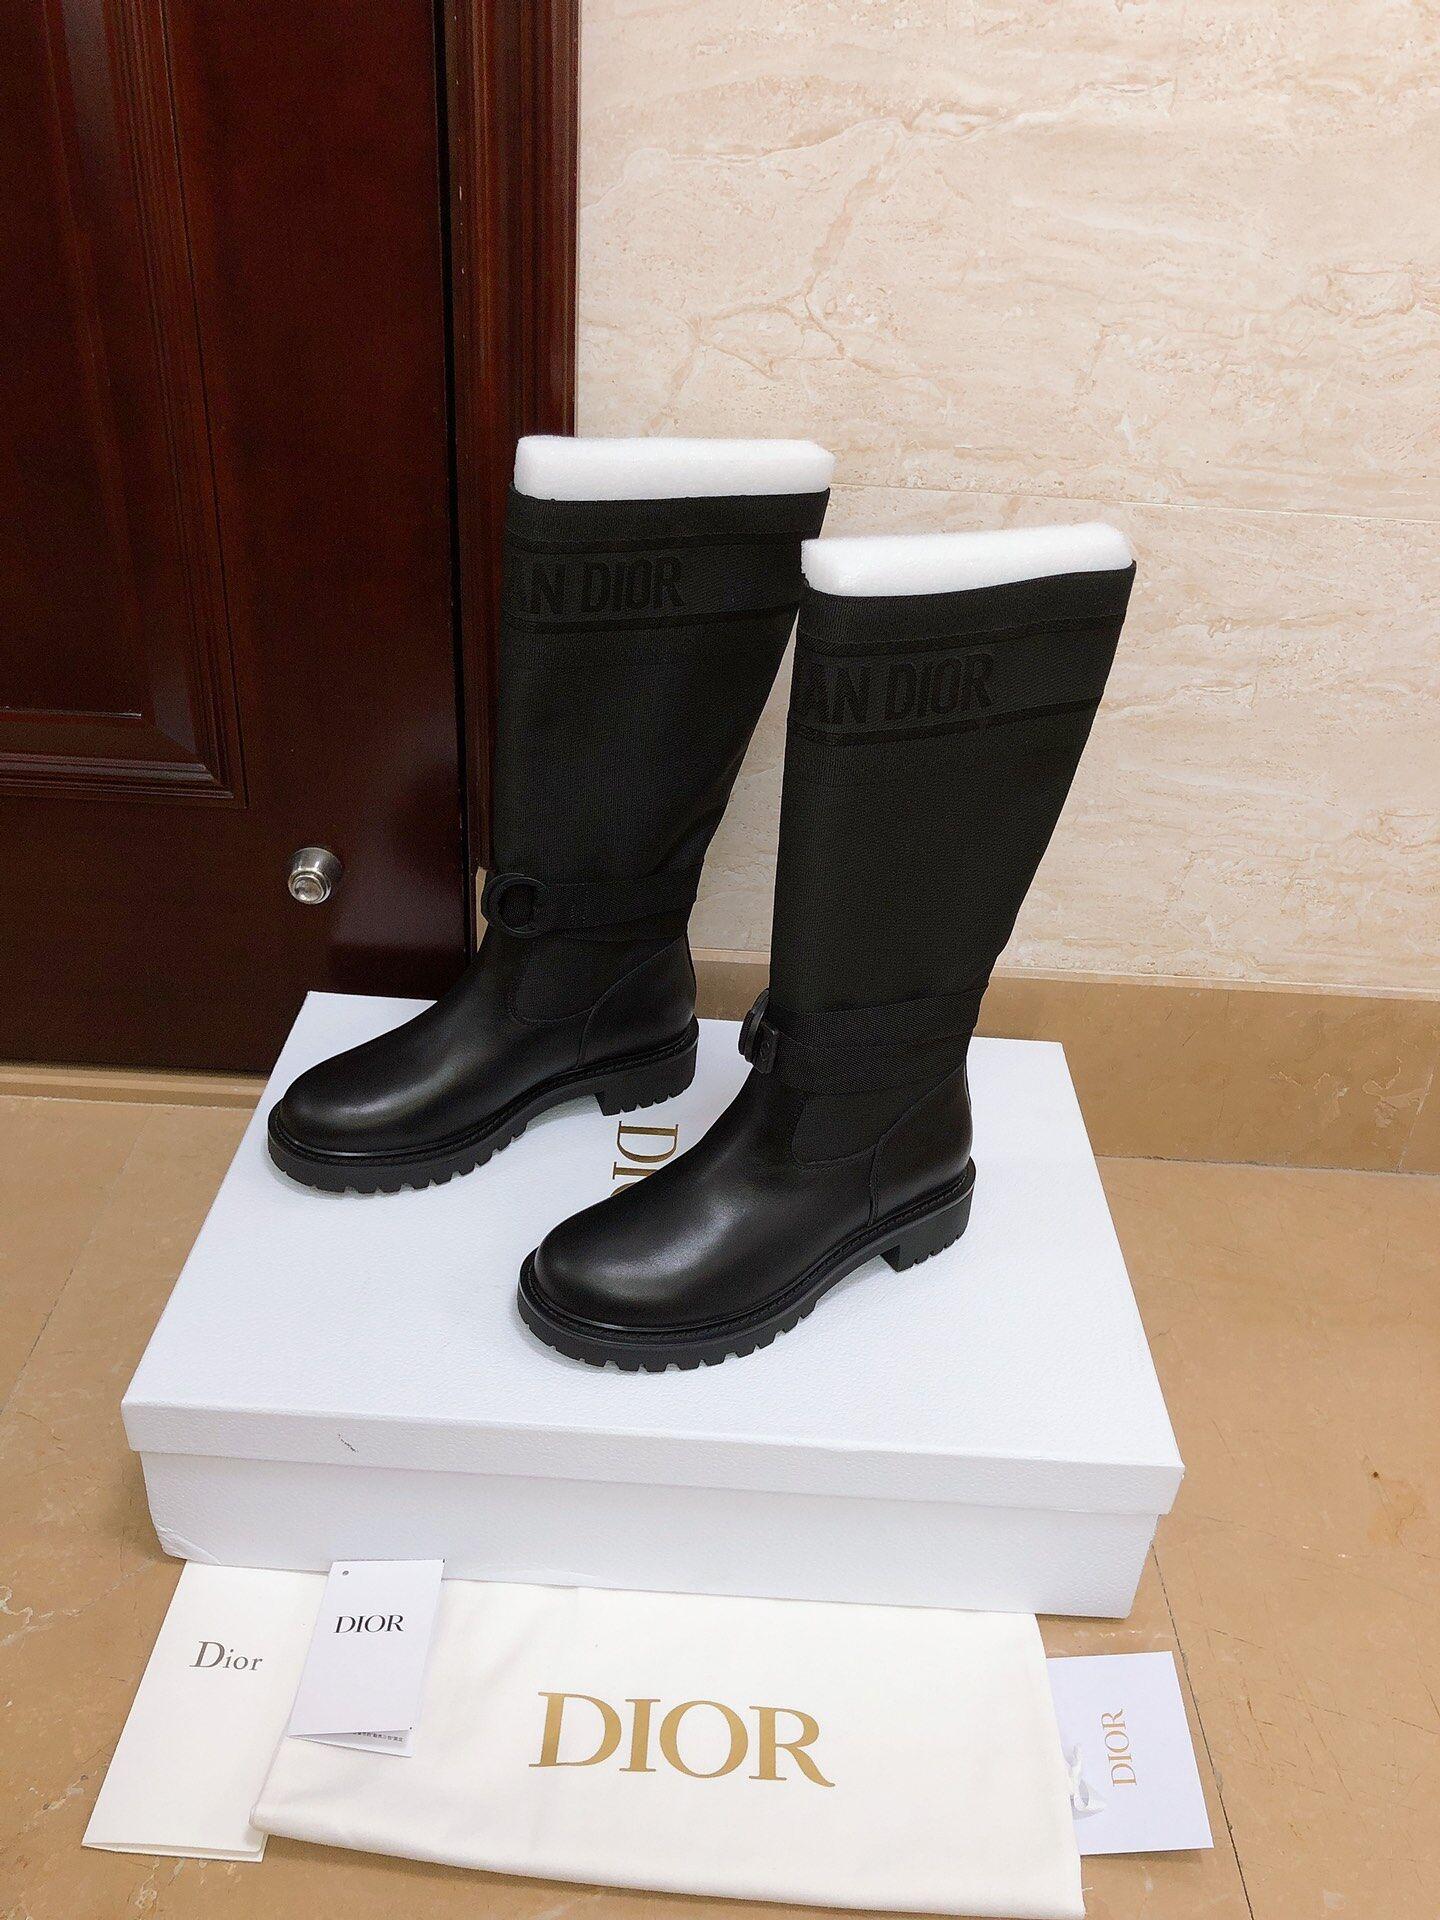 d major boot-black-technical-fabric-and-calfskin 9